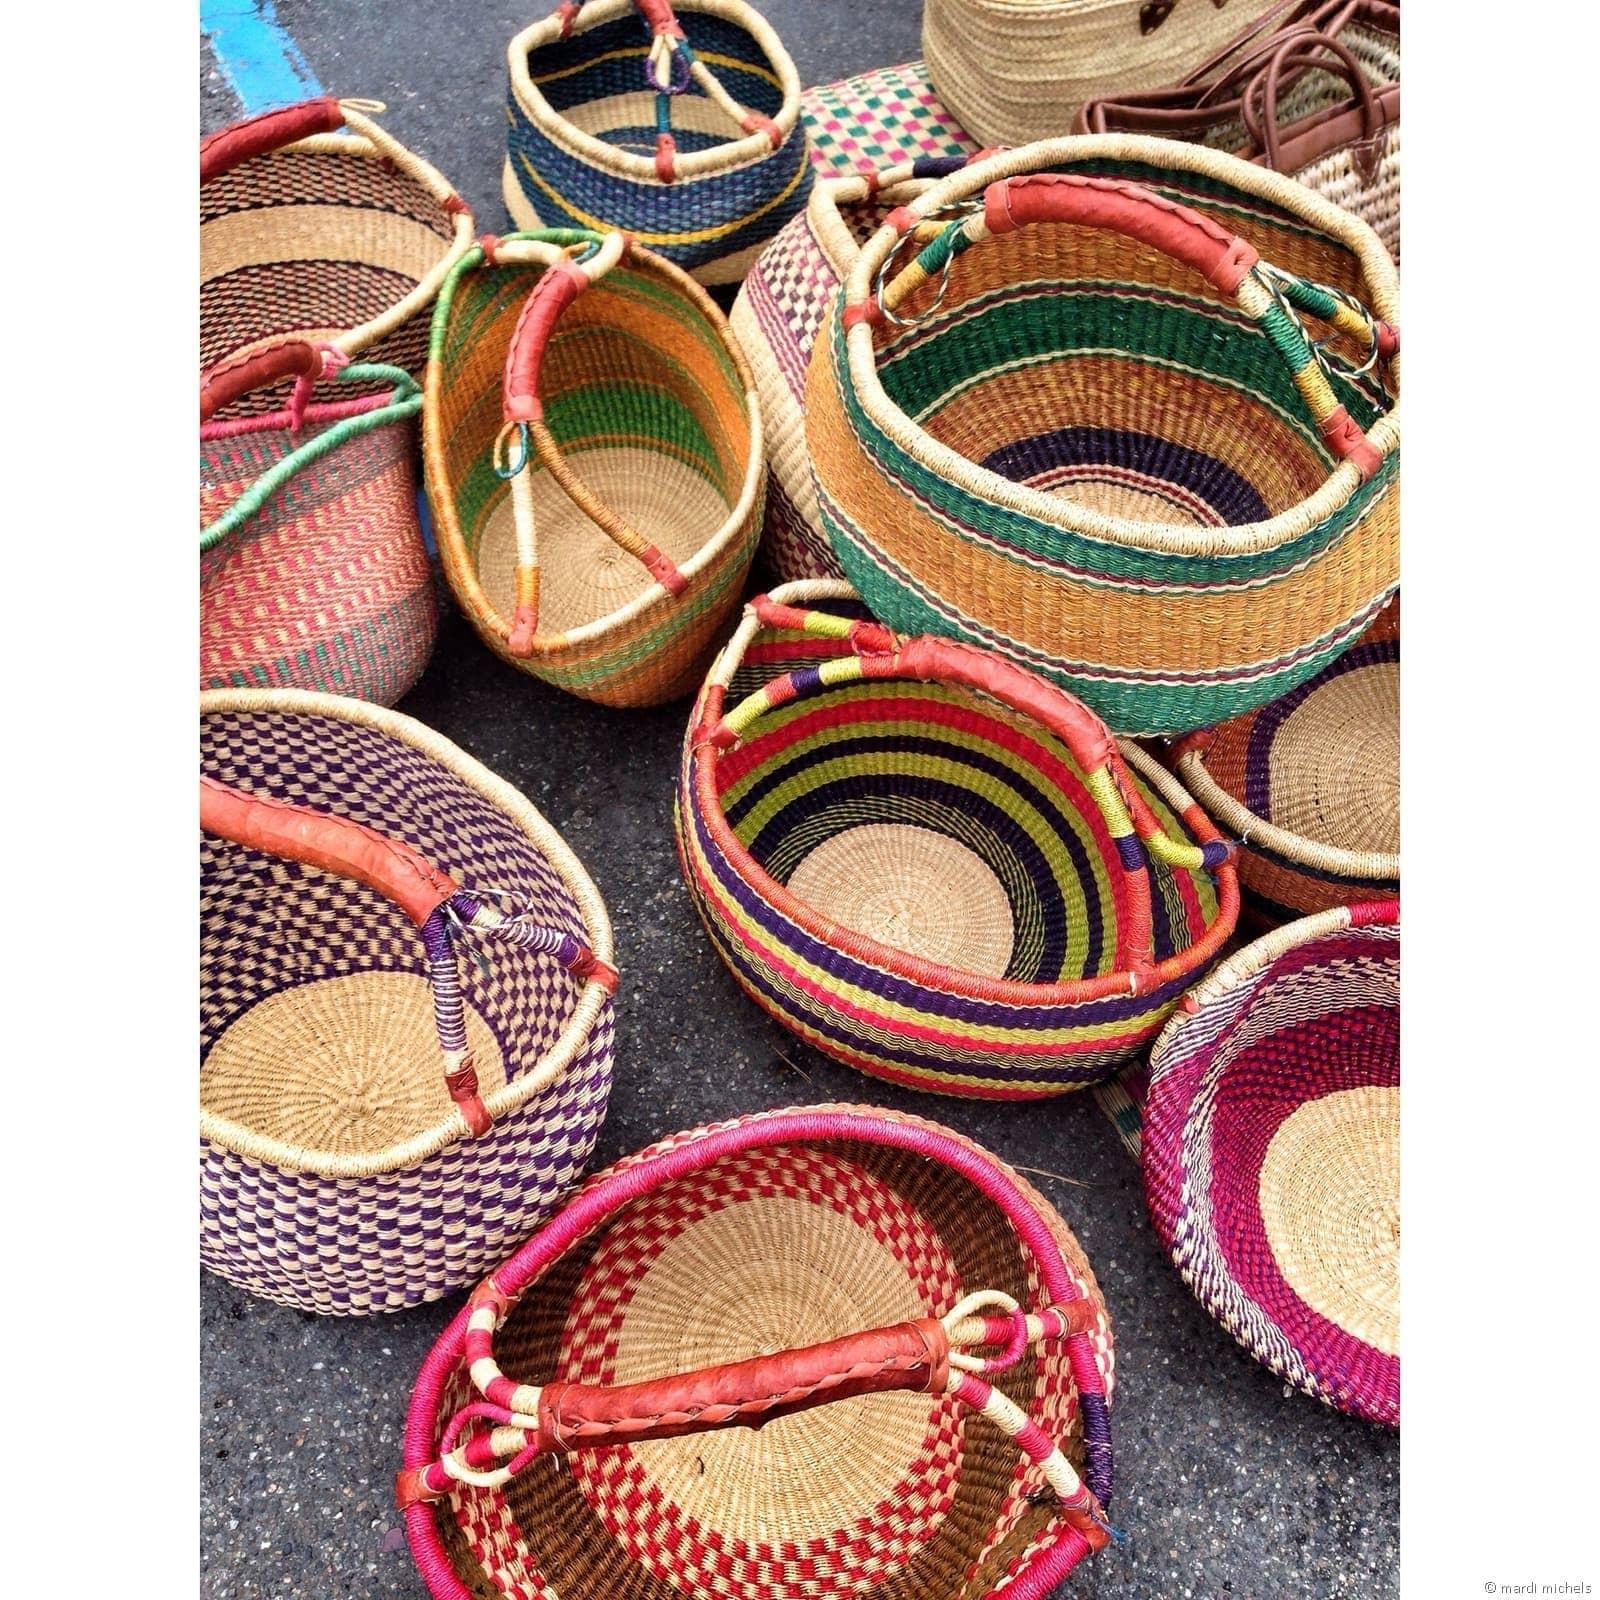 french baskets photo credit Mardi Michels